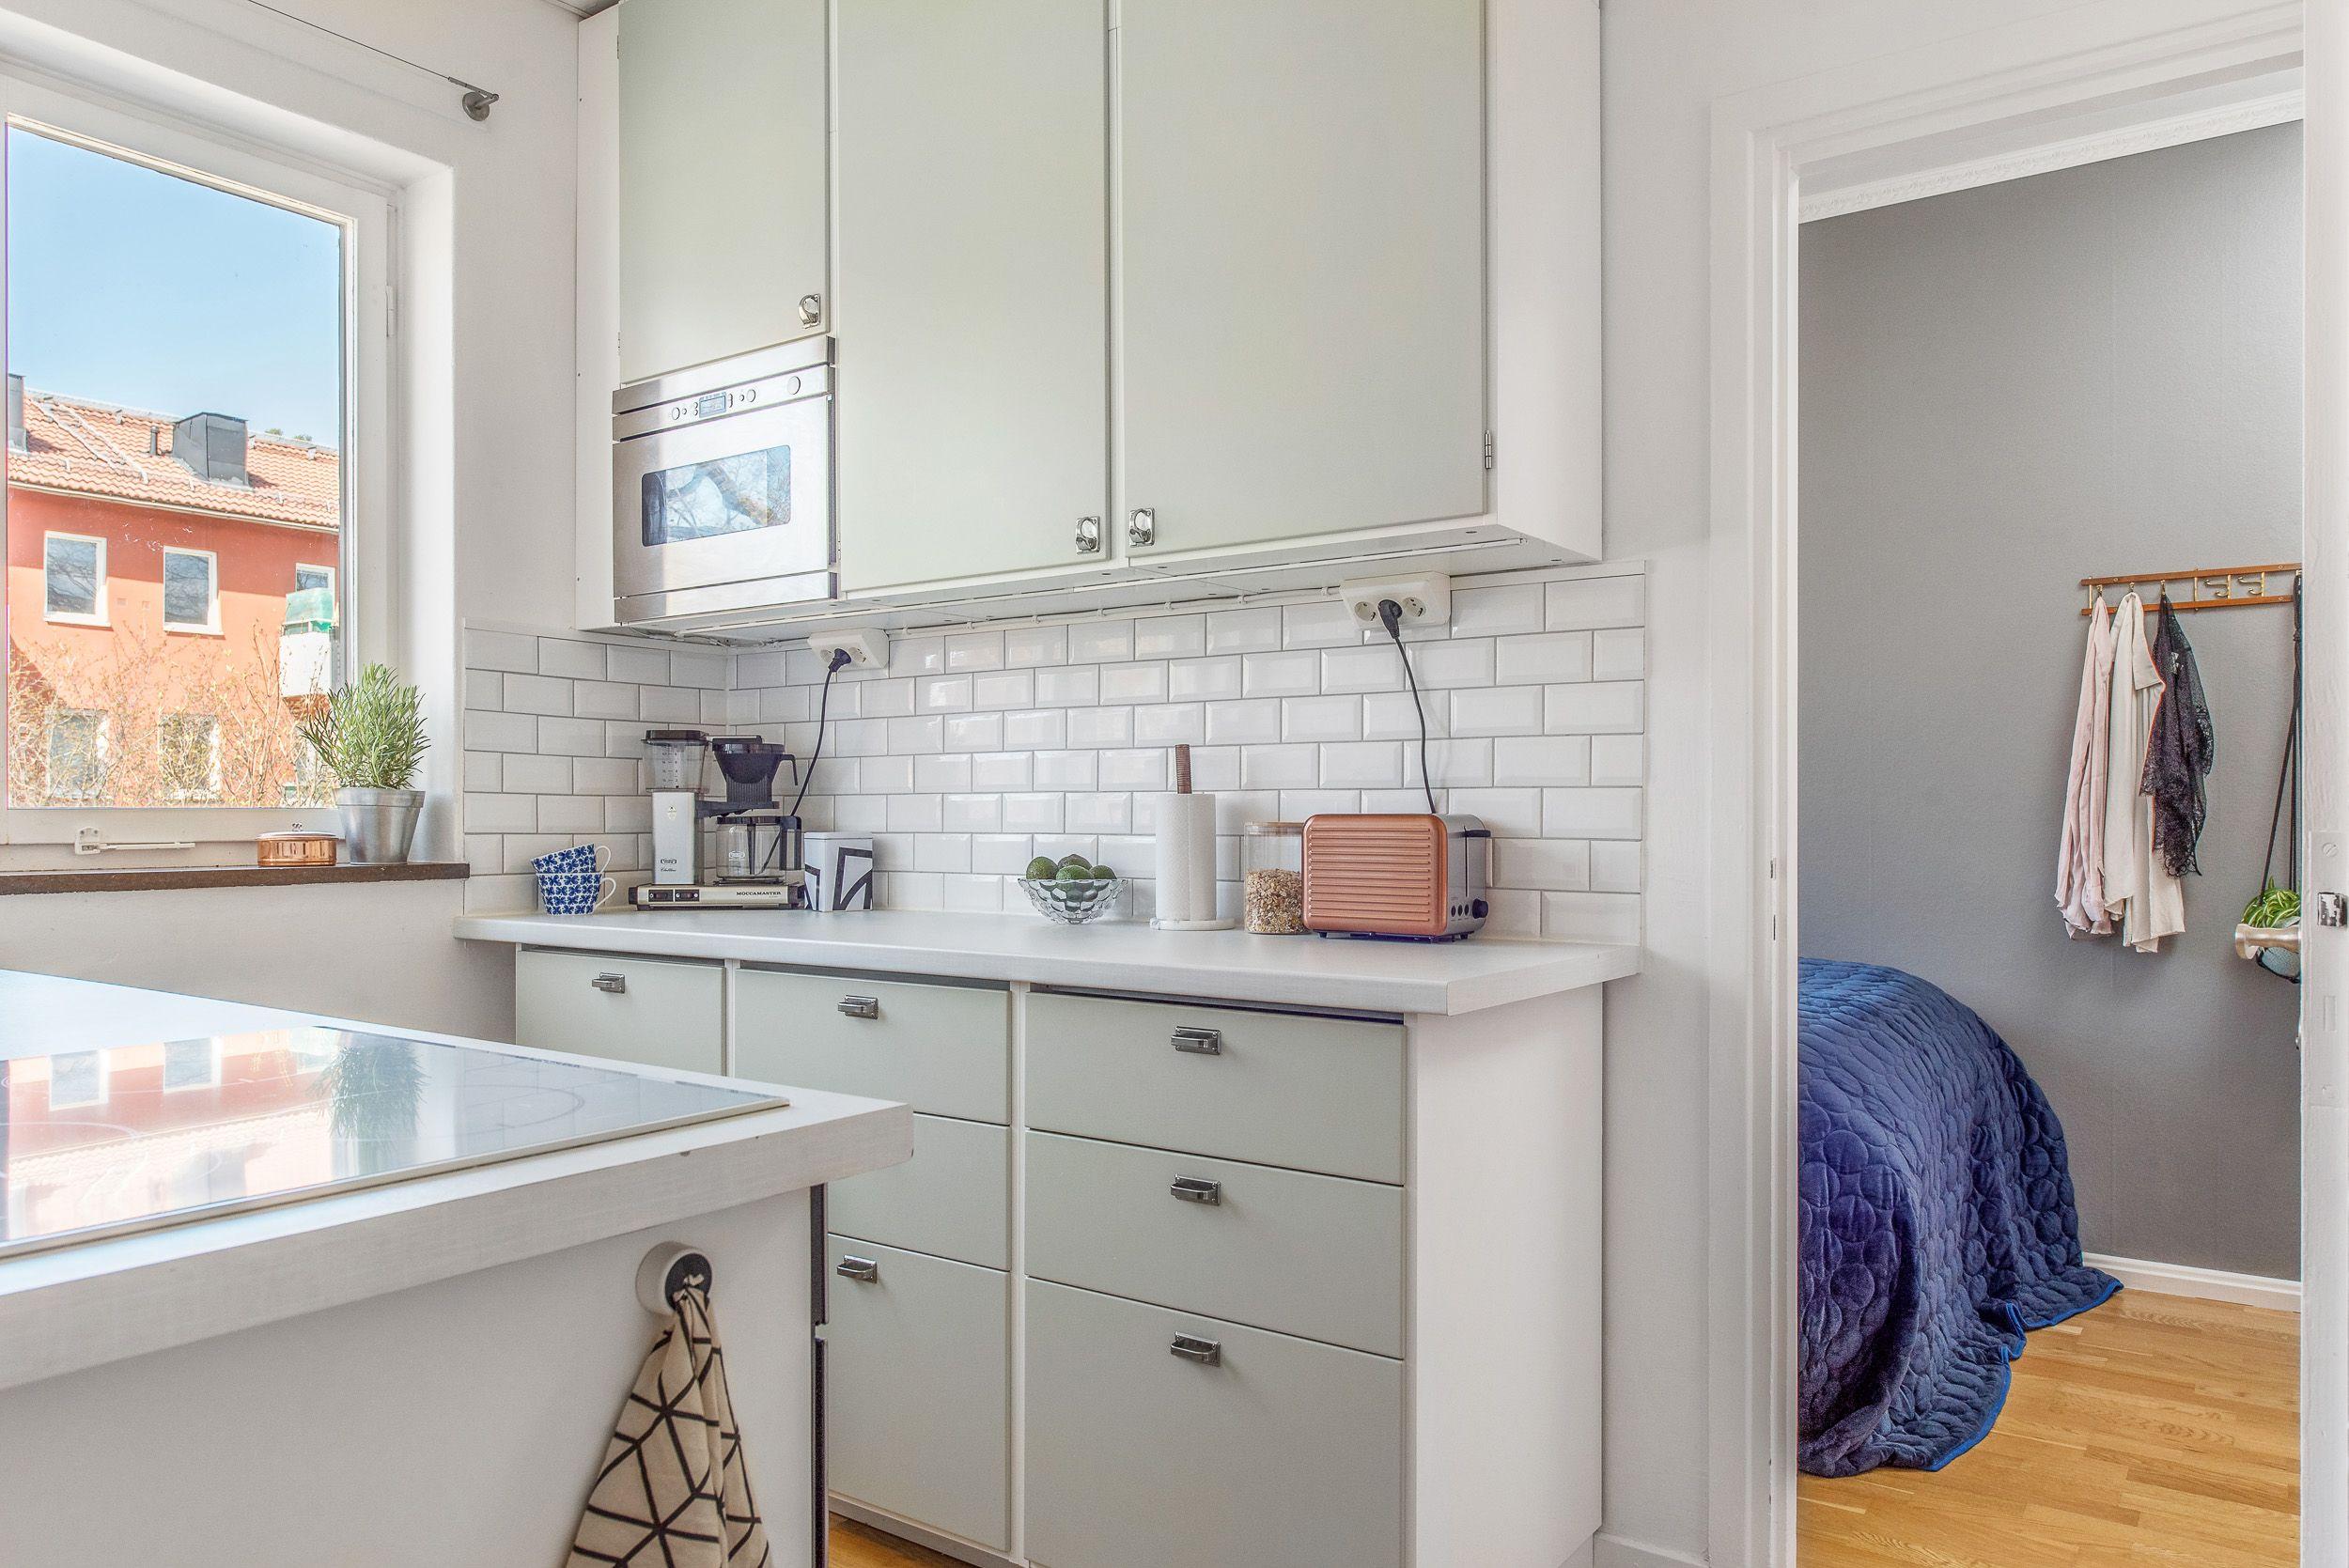 Renovated midcentury kitchen (40s, 50s, 60s style. Light ...